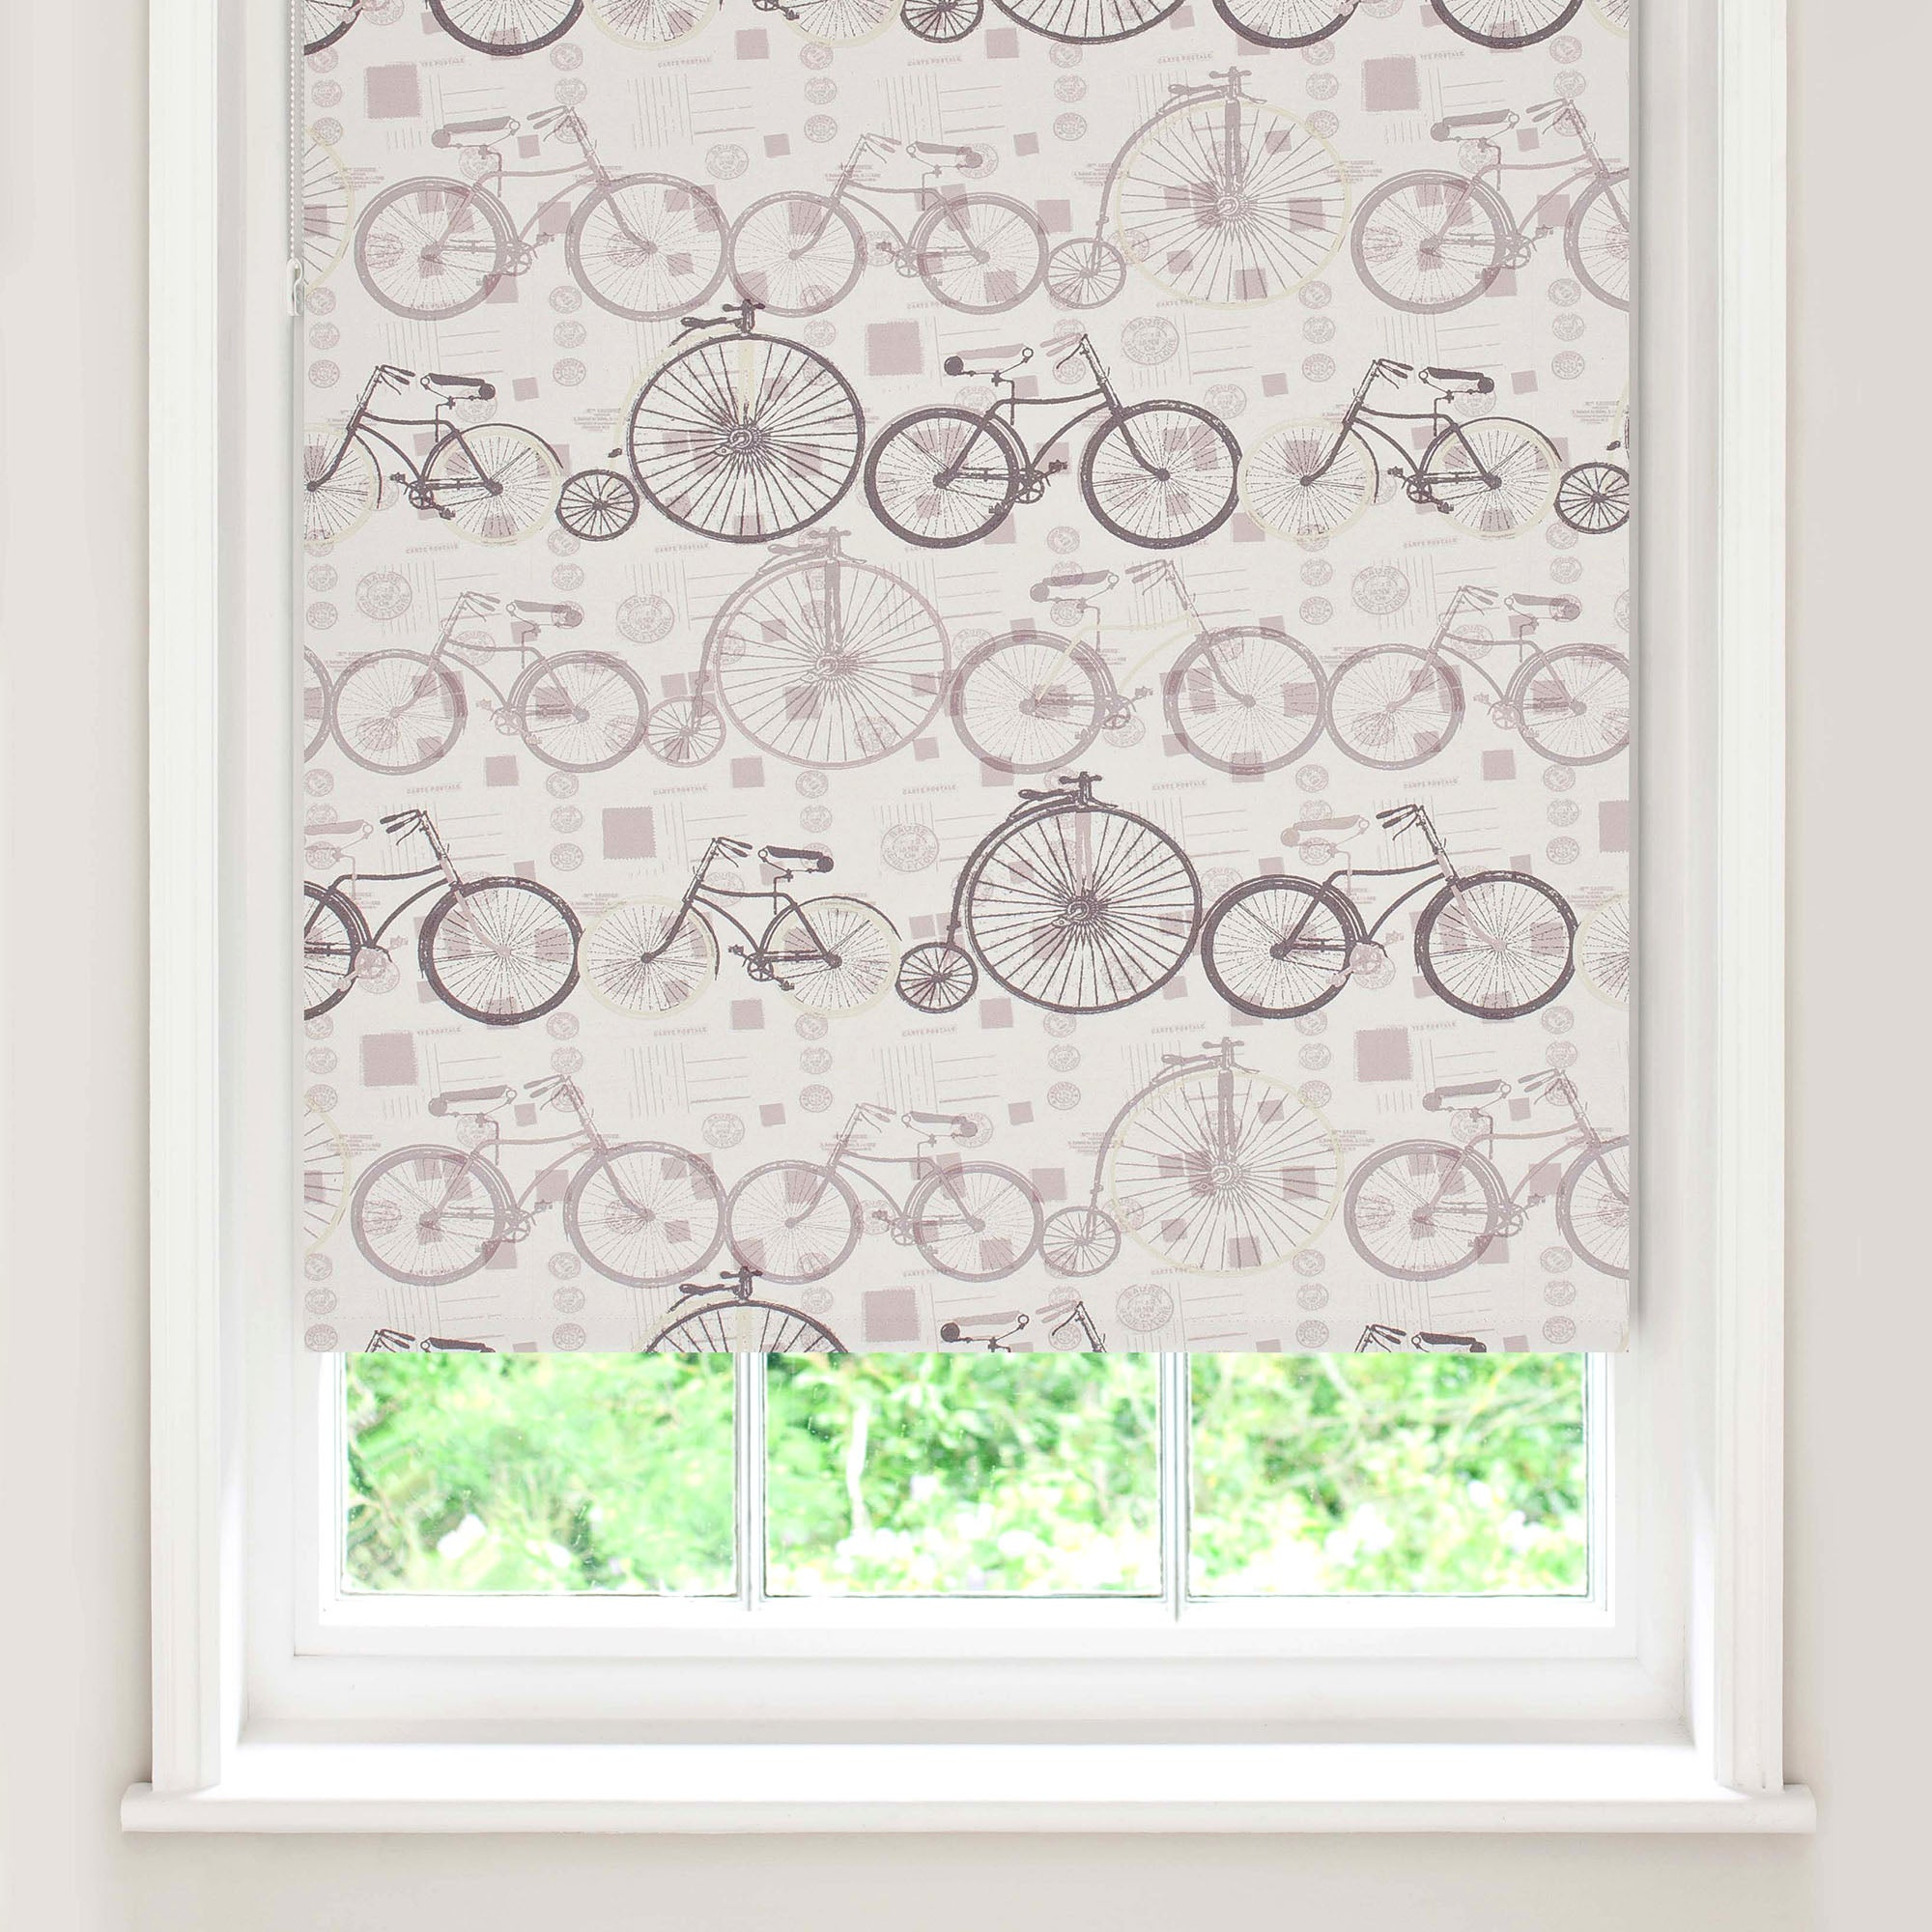 Bicycle Blackout Roller Blind